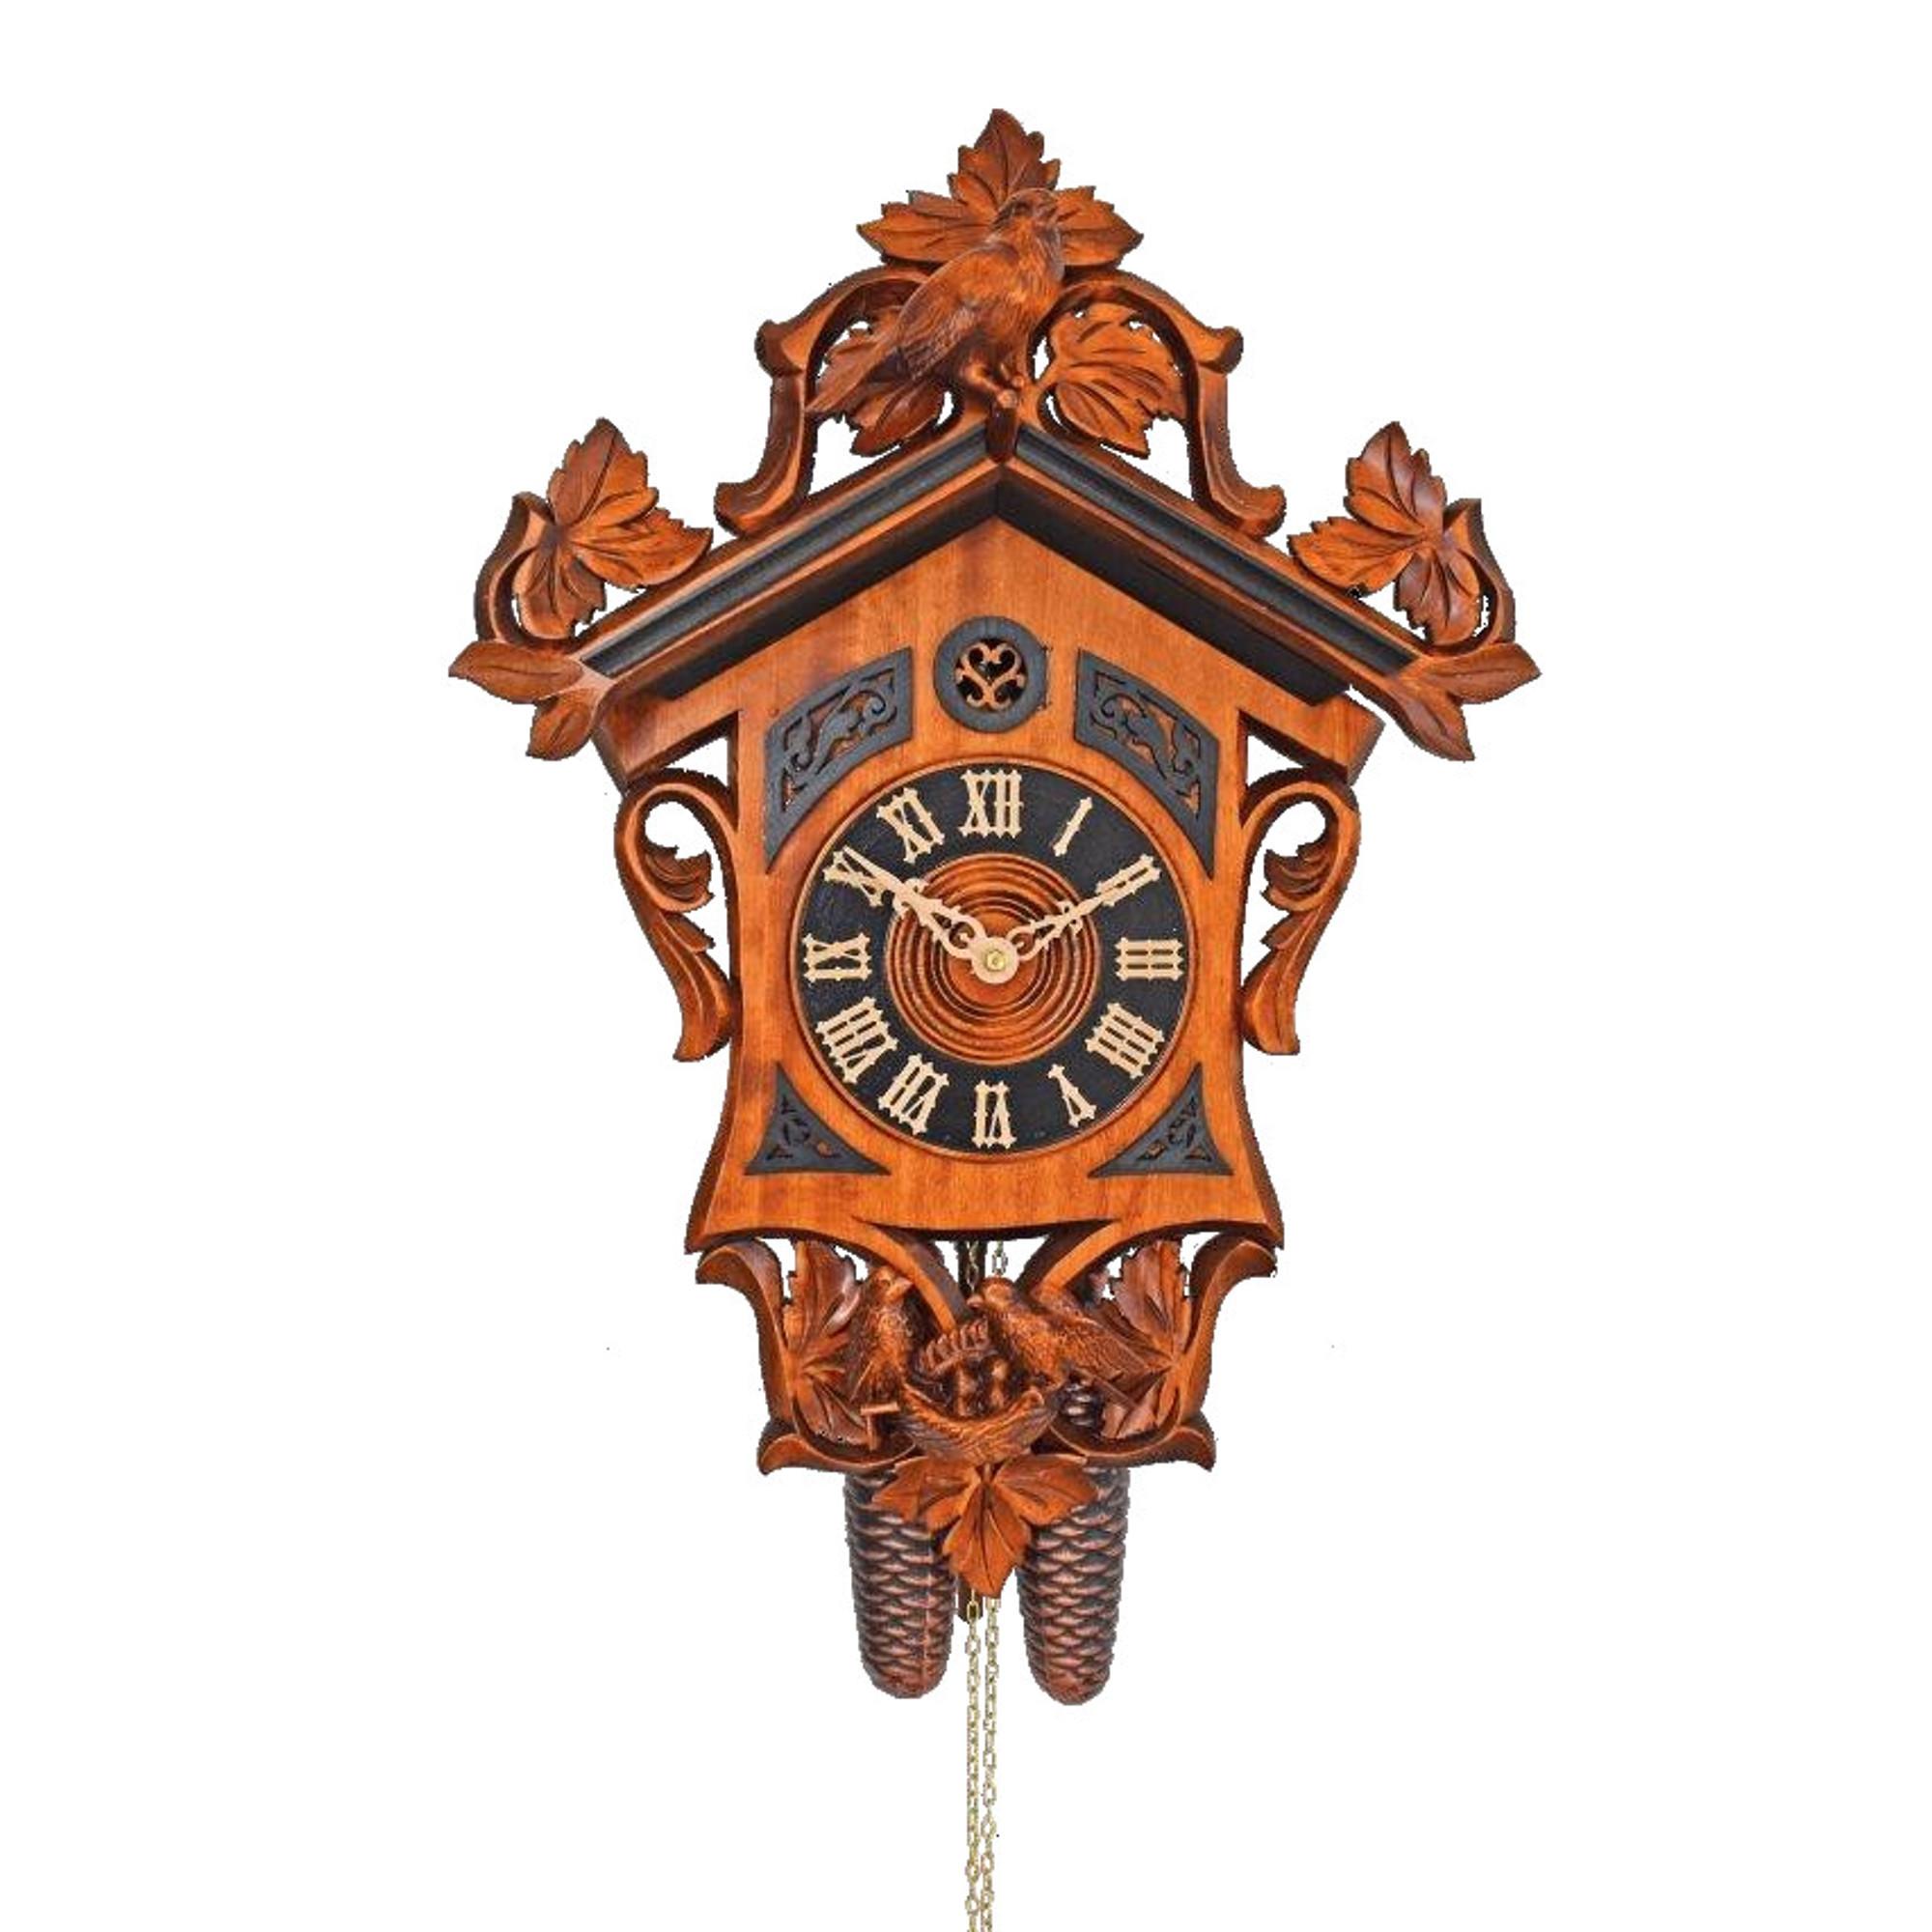 Gordon German Cuckoo Clock